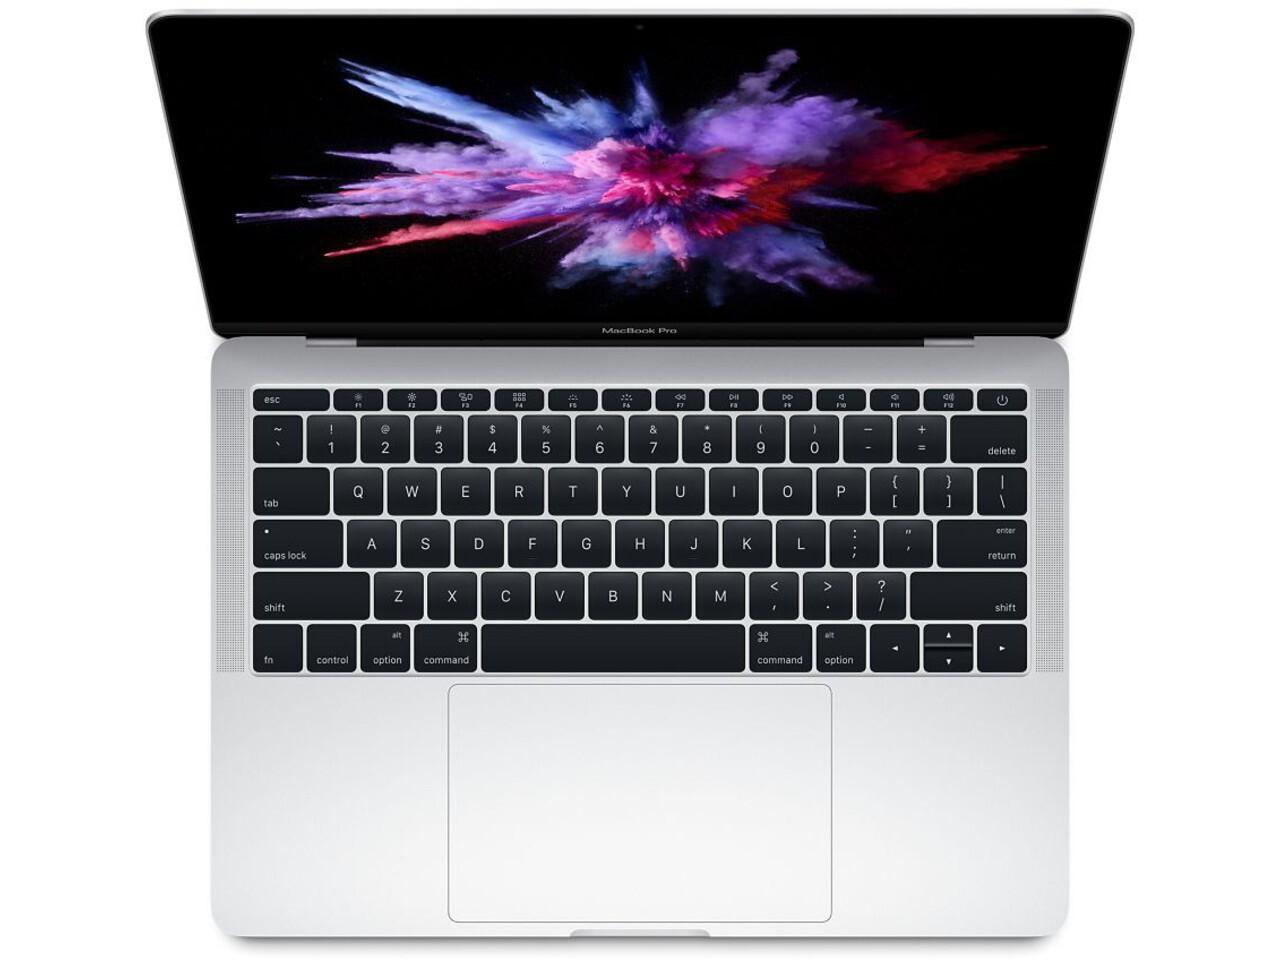 macbook pro 13 inch 2016 silver